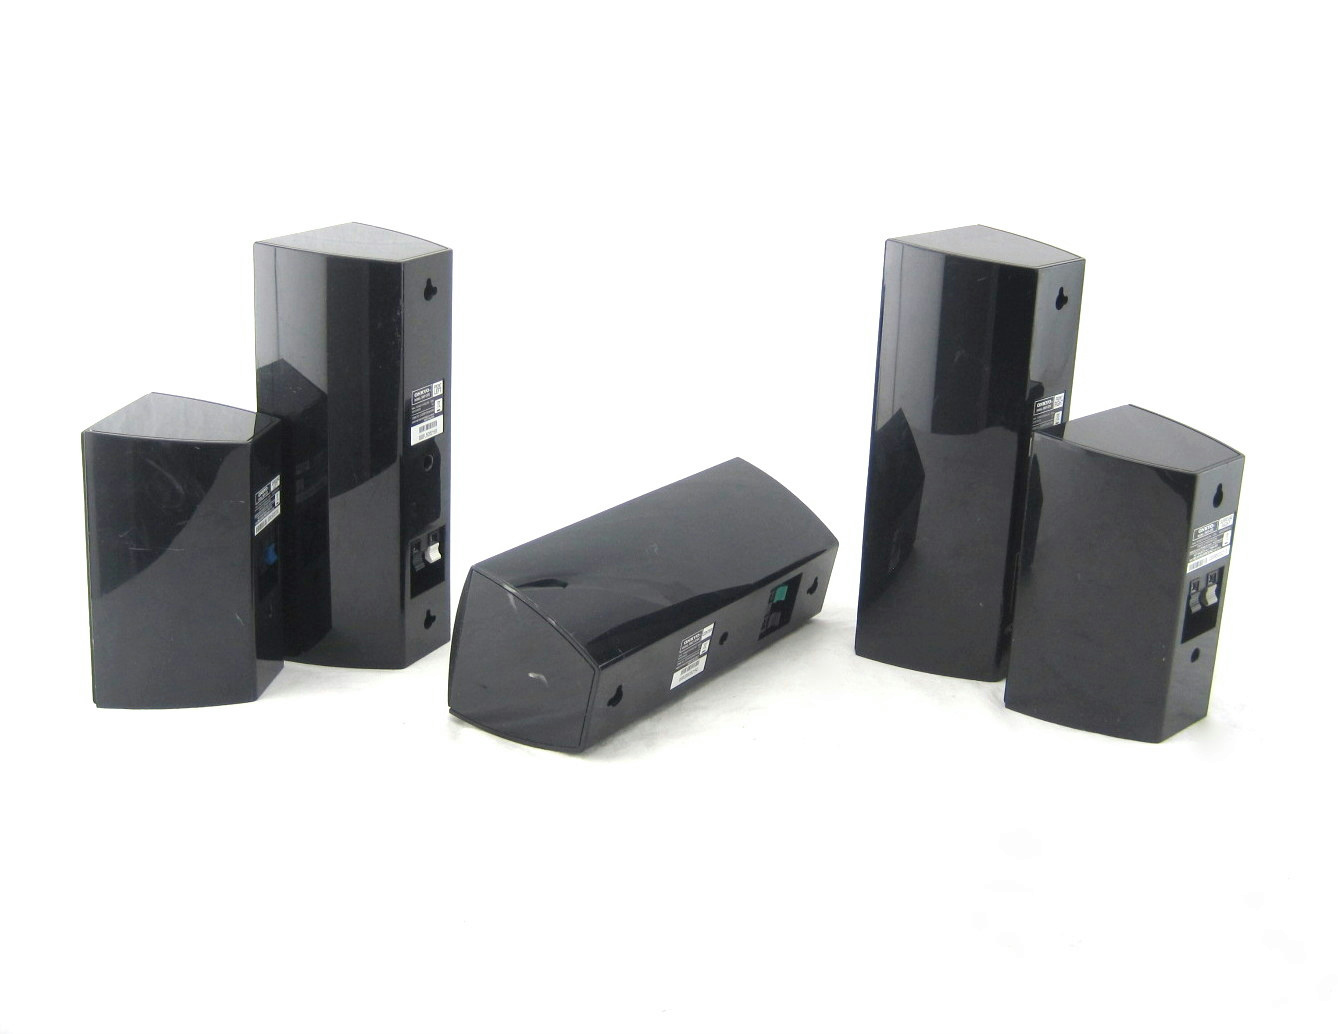 set of 5 onkyo 370 home theater speaker system surround sound speakers used ebay. Black Bedroom Furniture Sets. Home Design Ideas